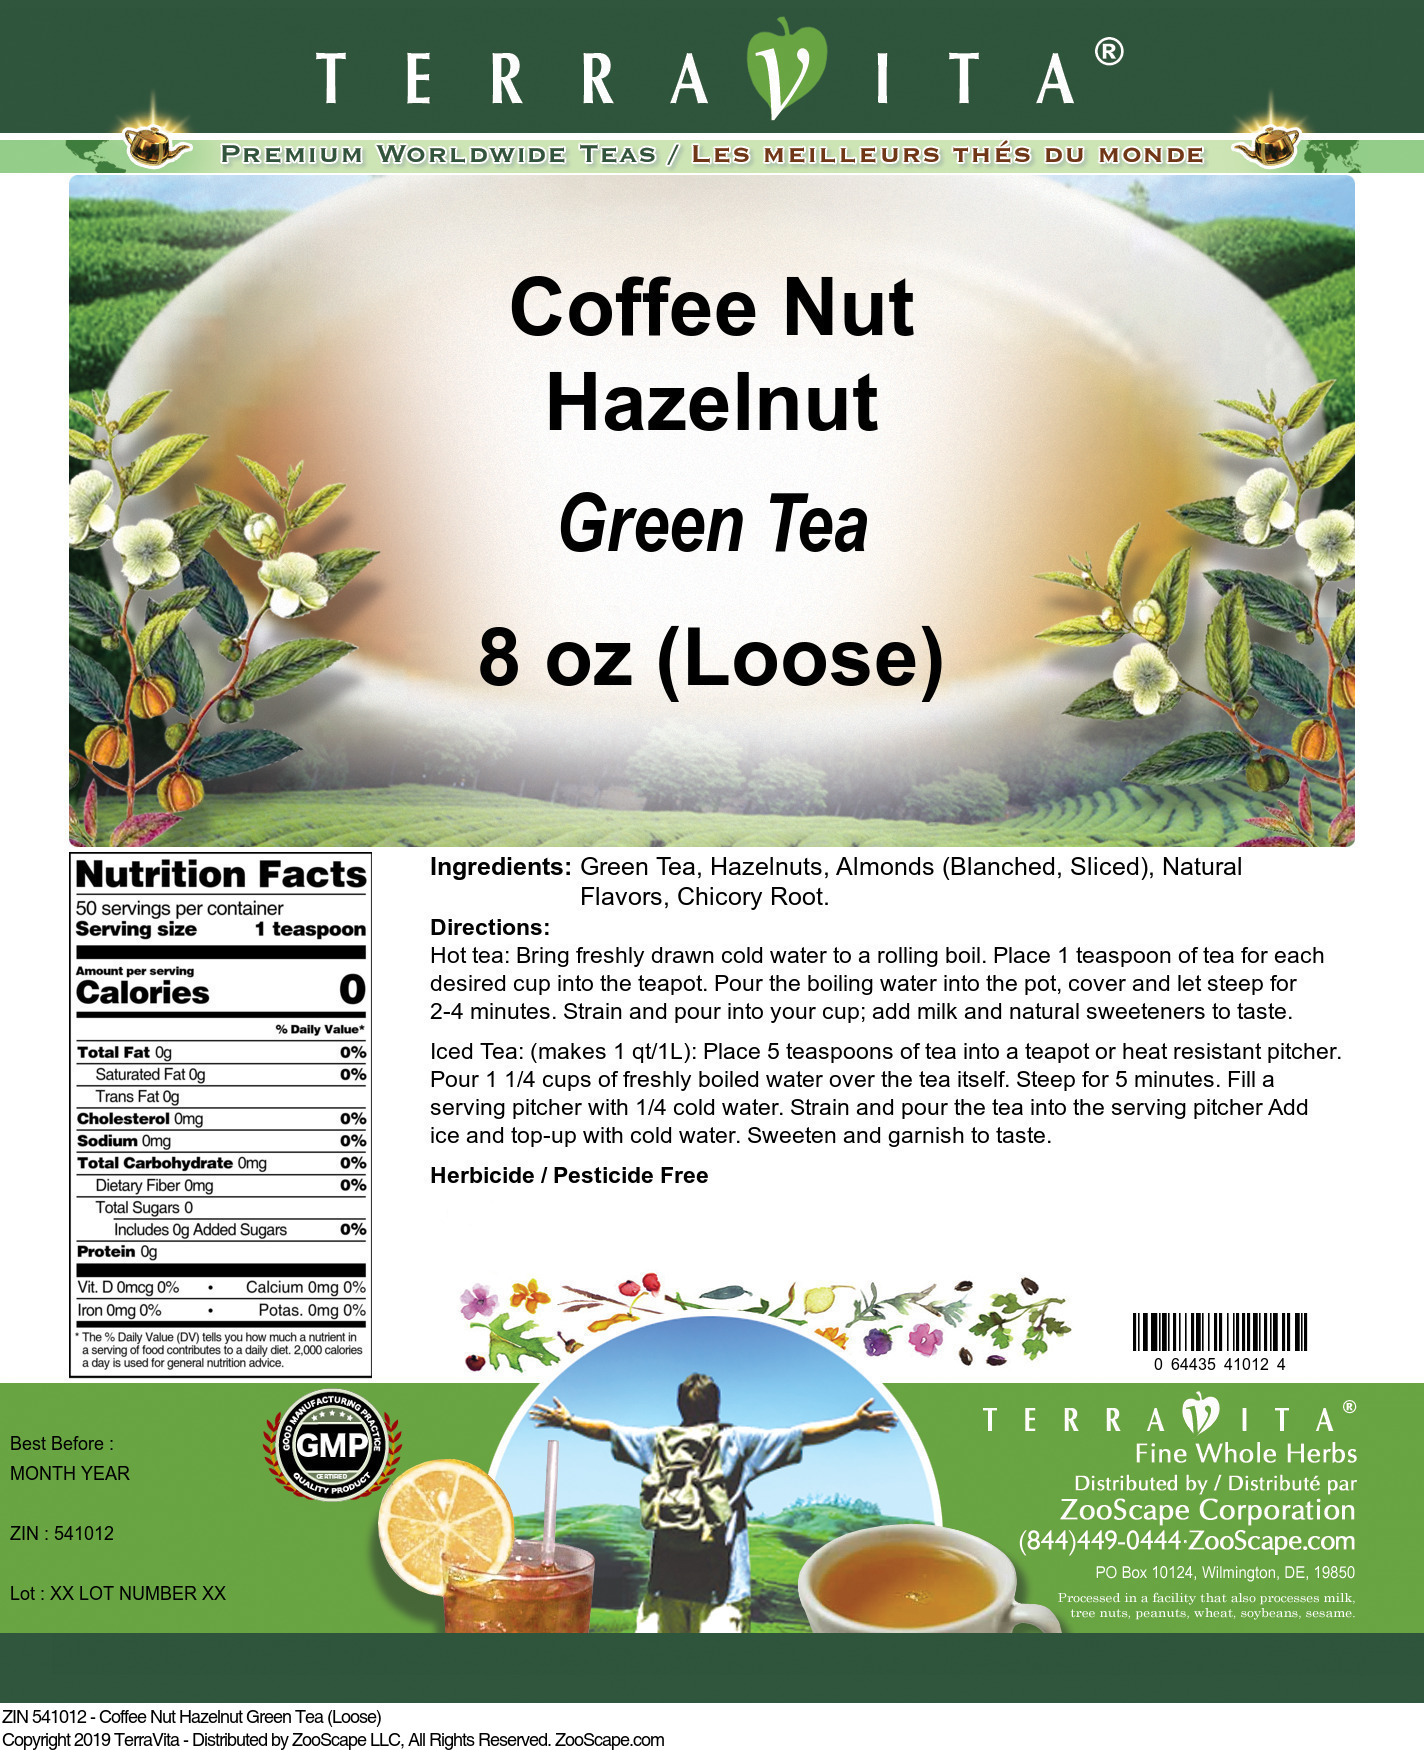 Coffee Nut Hazelnut Green Tea